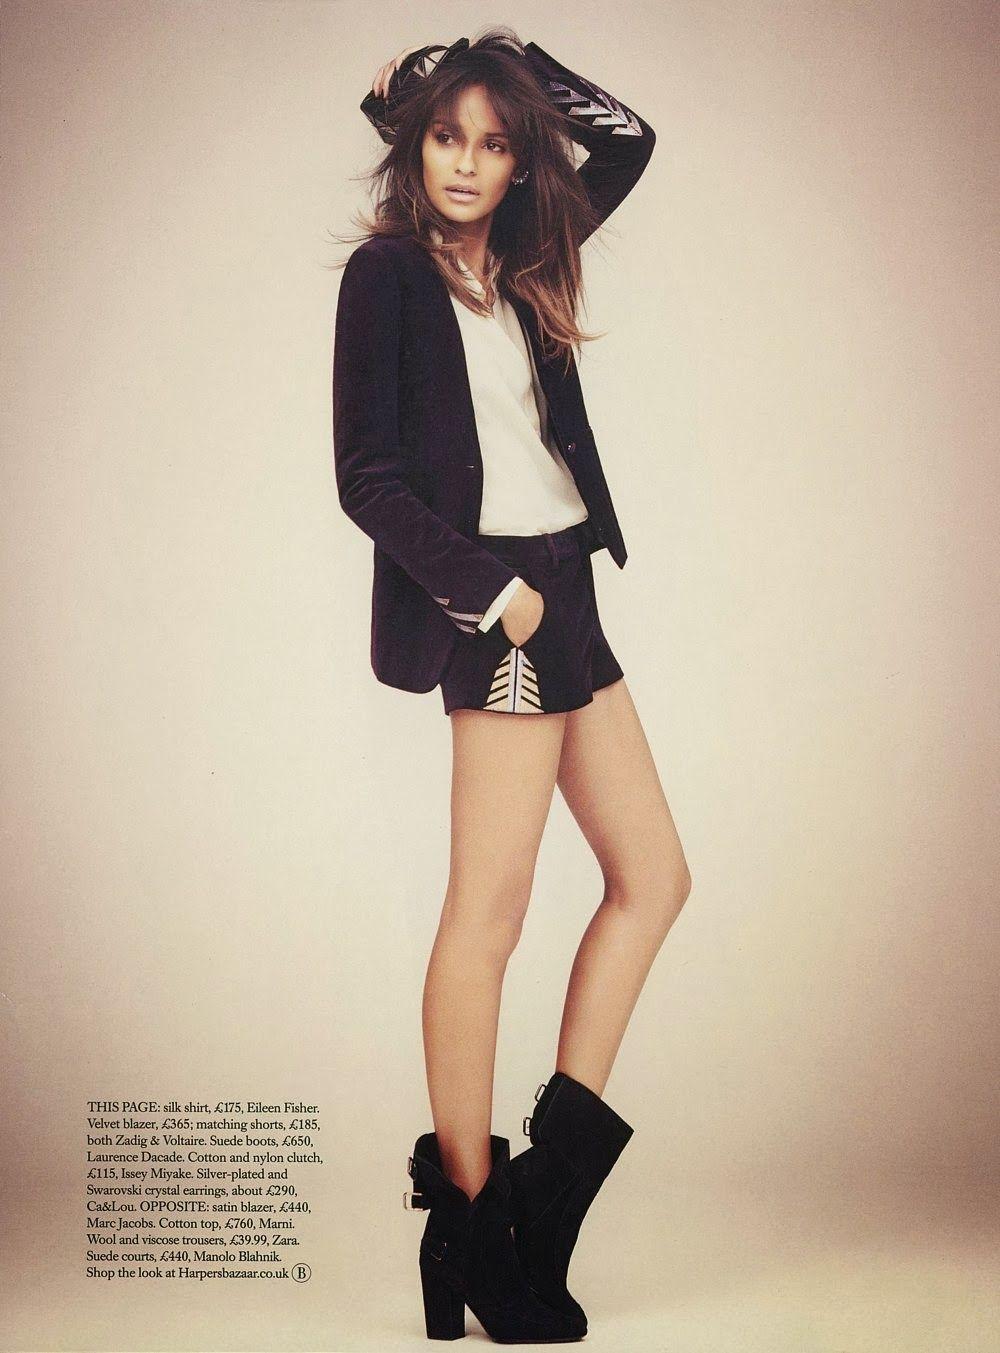 Gracie+Carvalho+for+Harper%E2%80%99s+Bazaar+UK+January+2014